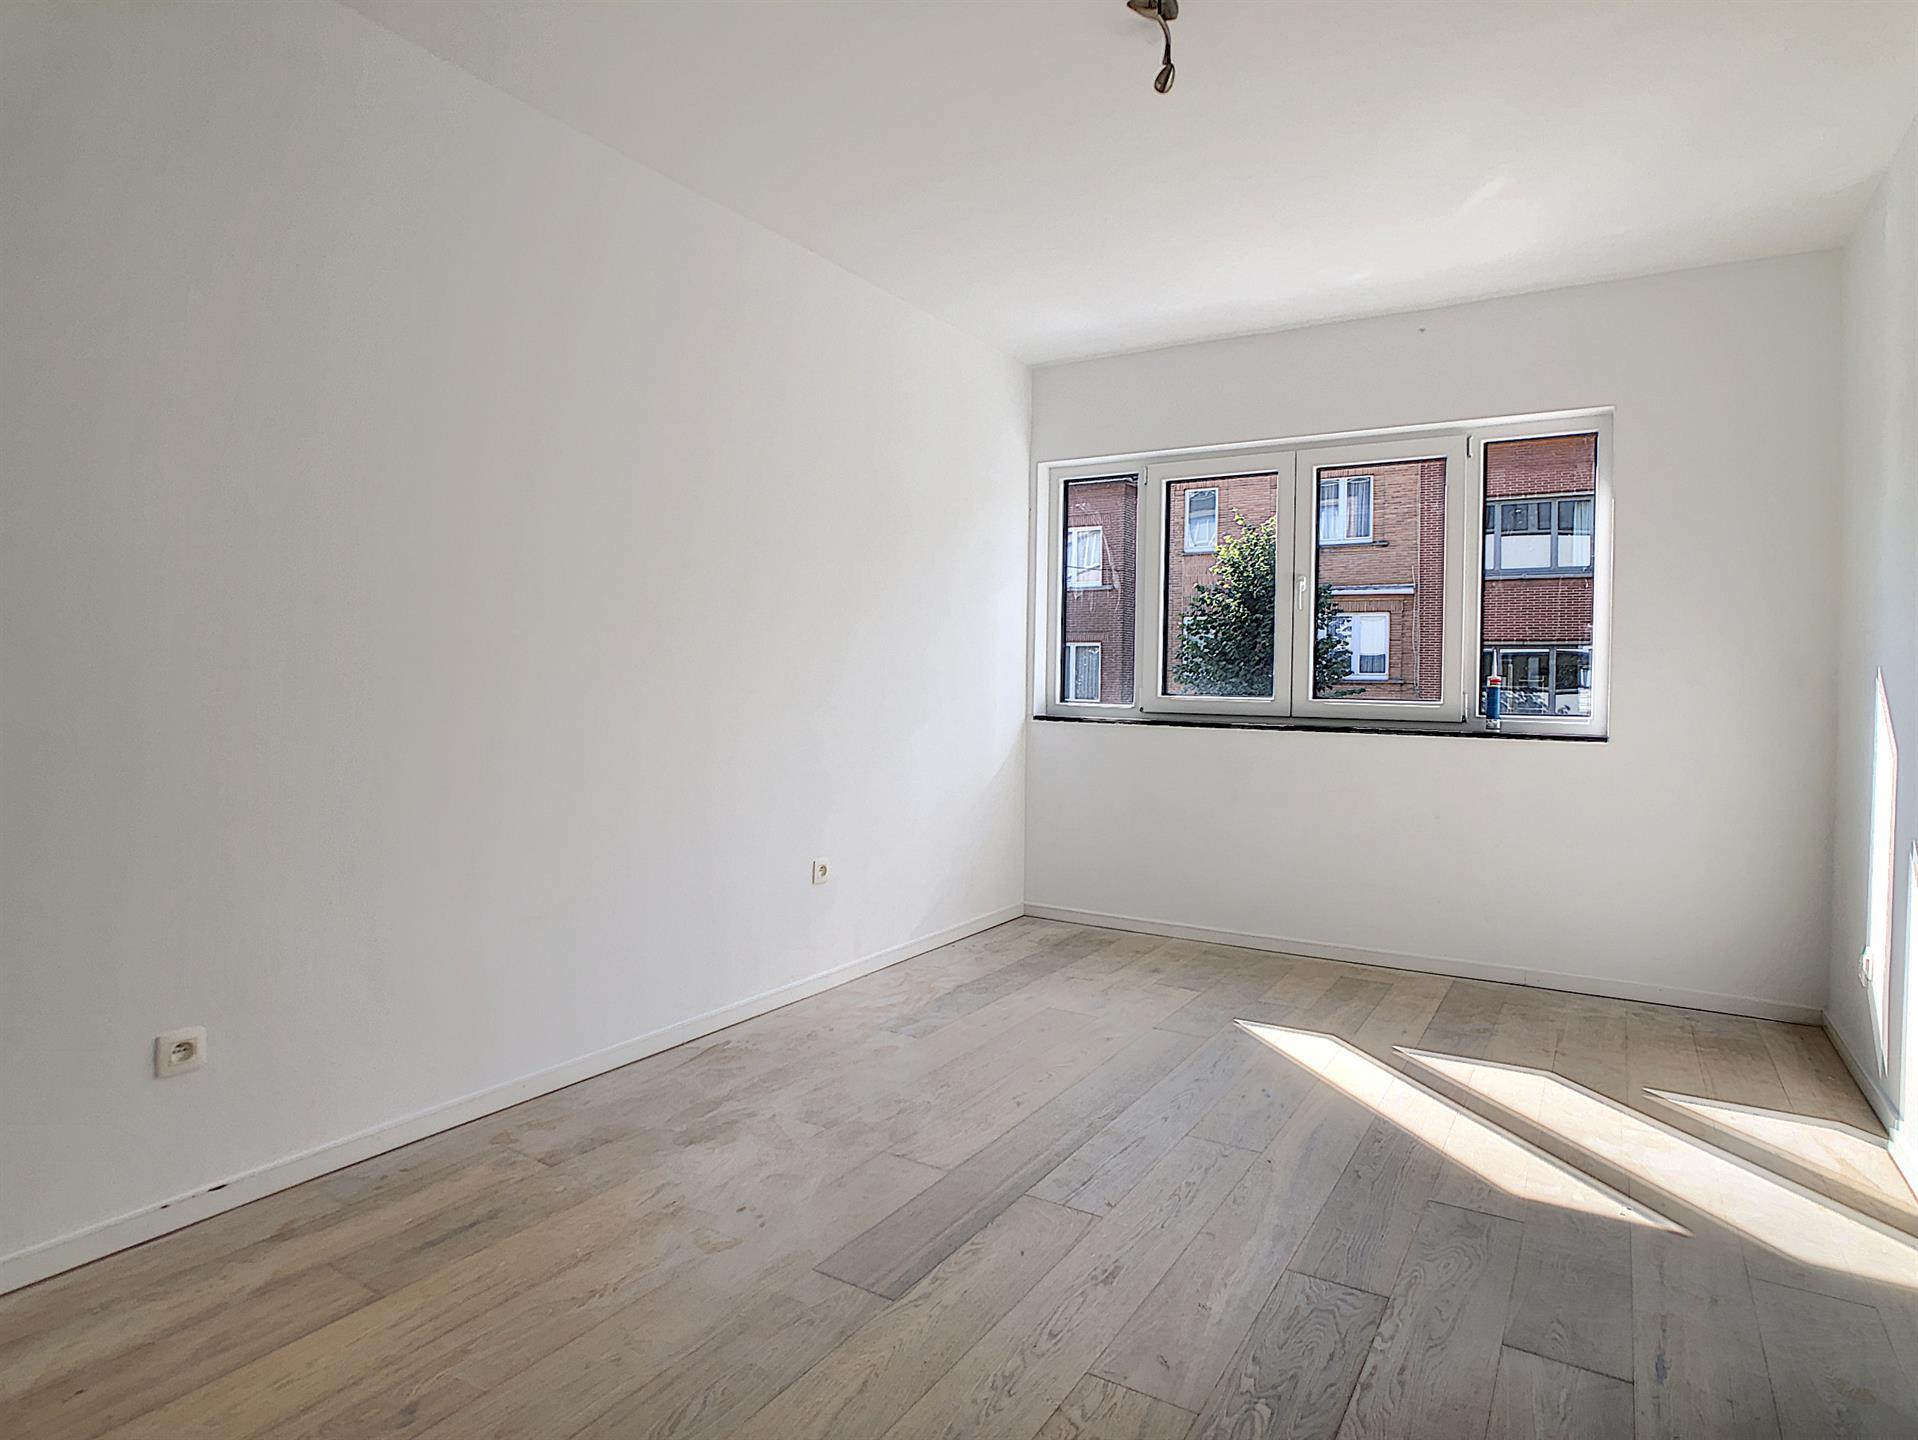 Appartement - Anderlecht - #4252375-26